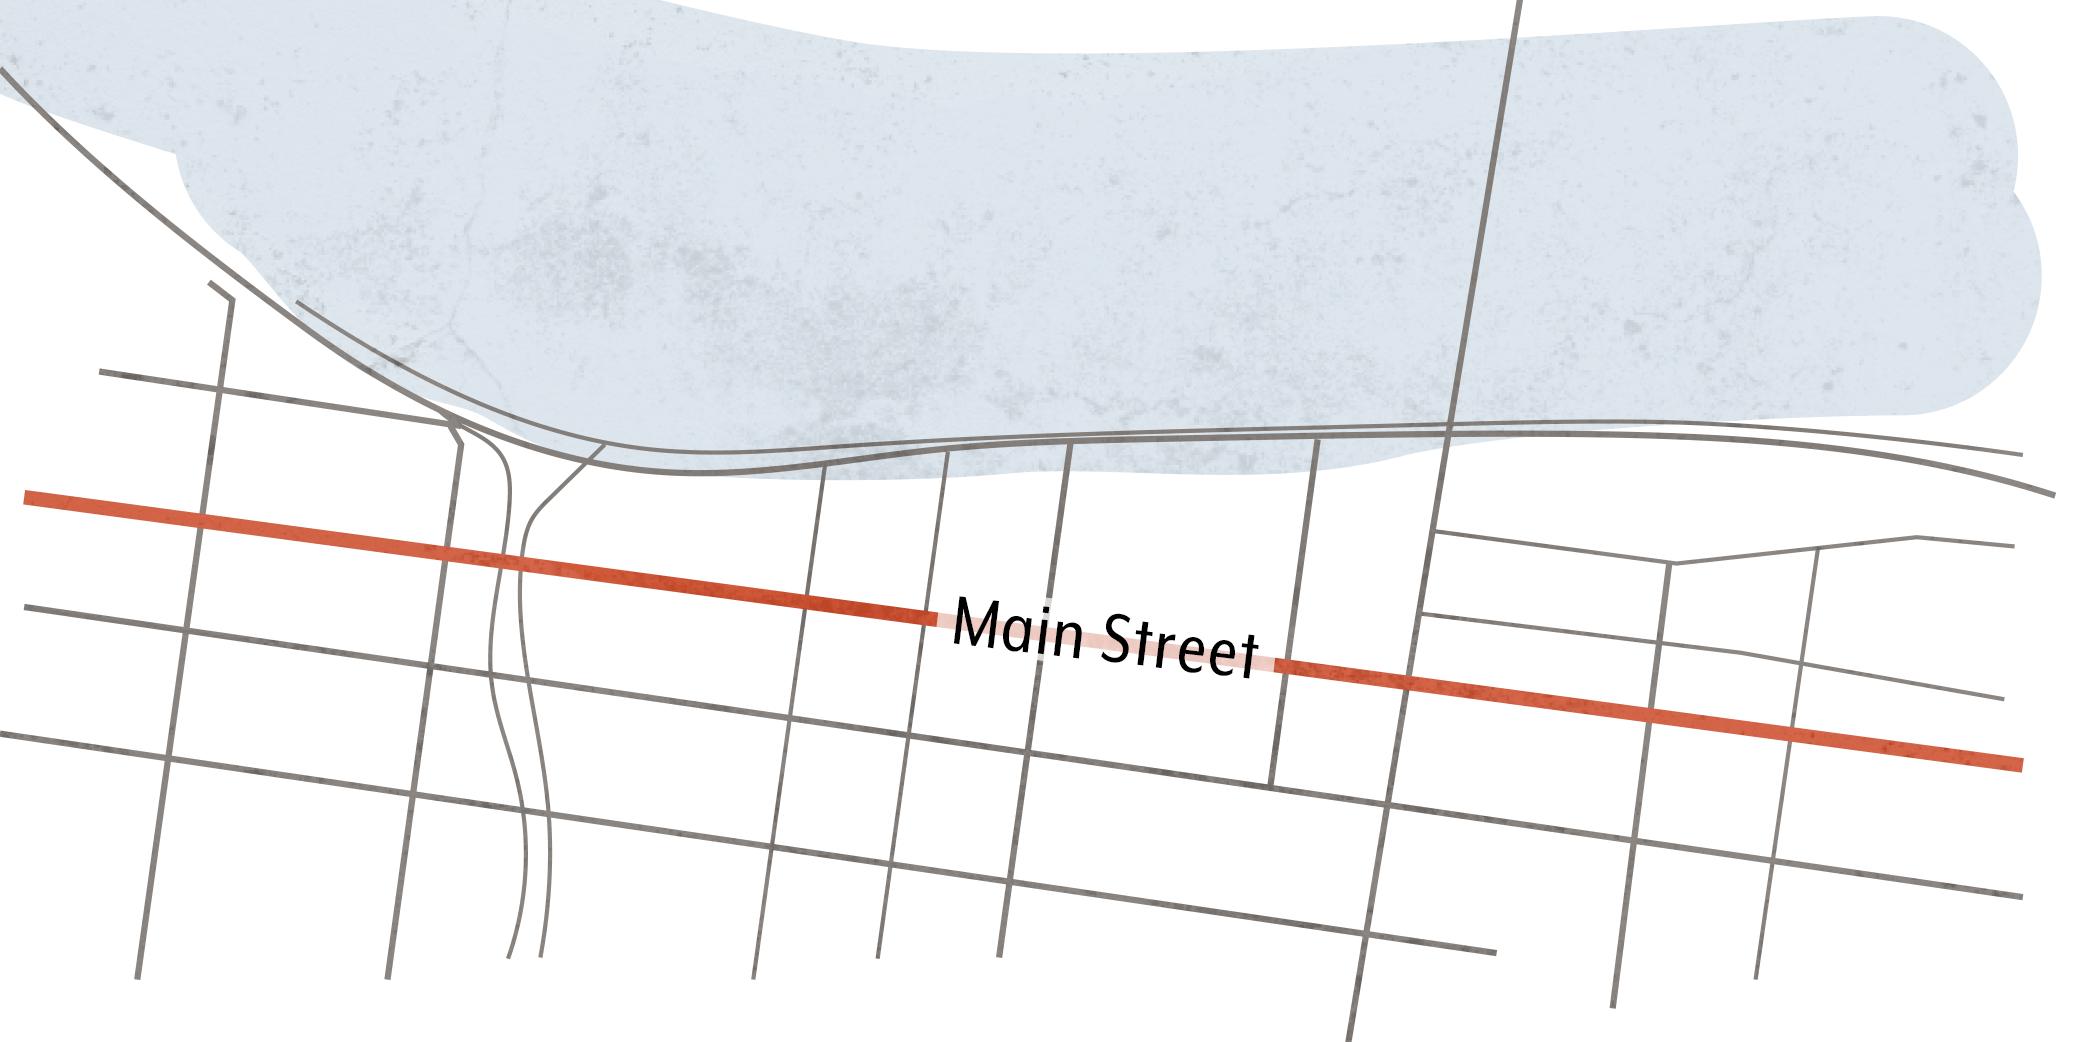 map of louisville